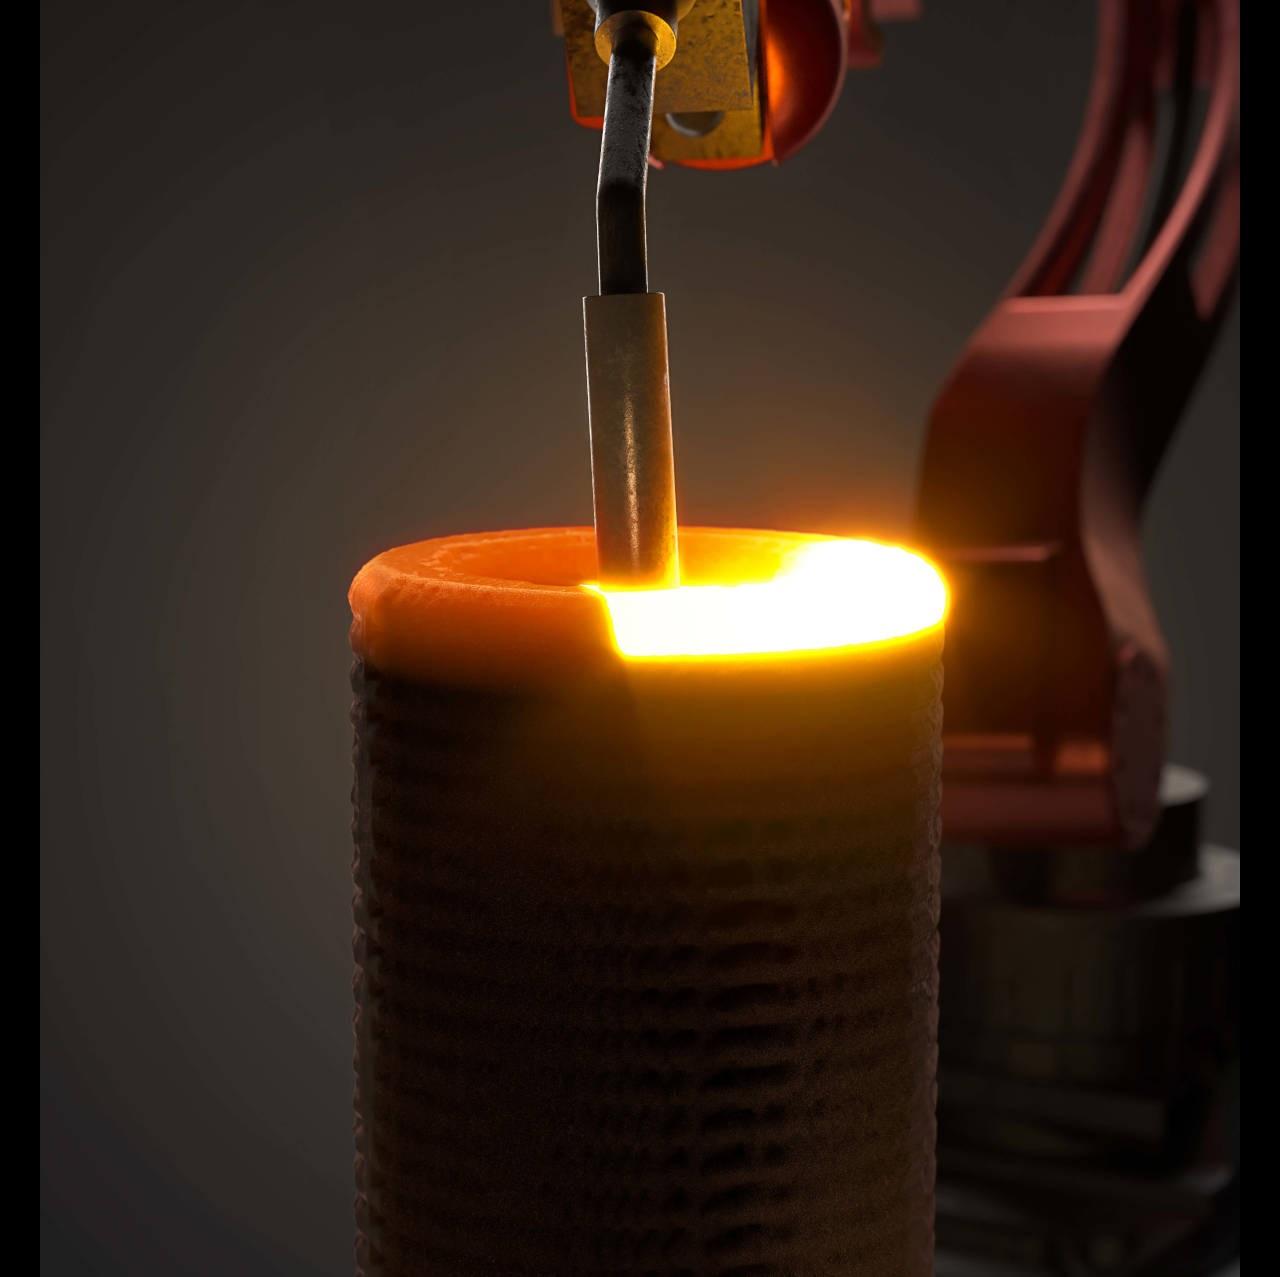 Vallourec Additive Manufacturing solutions